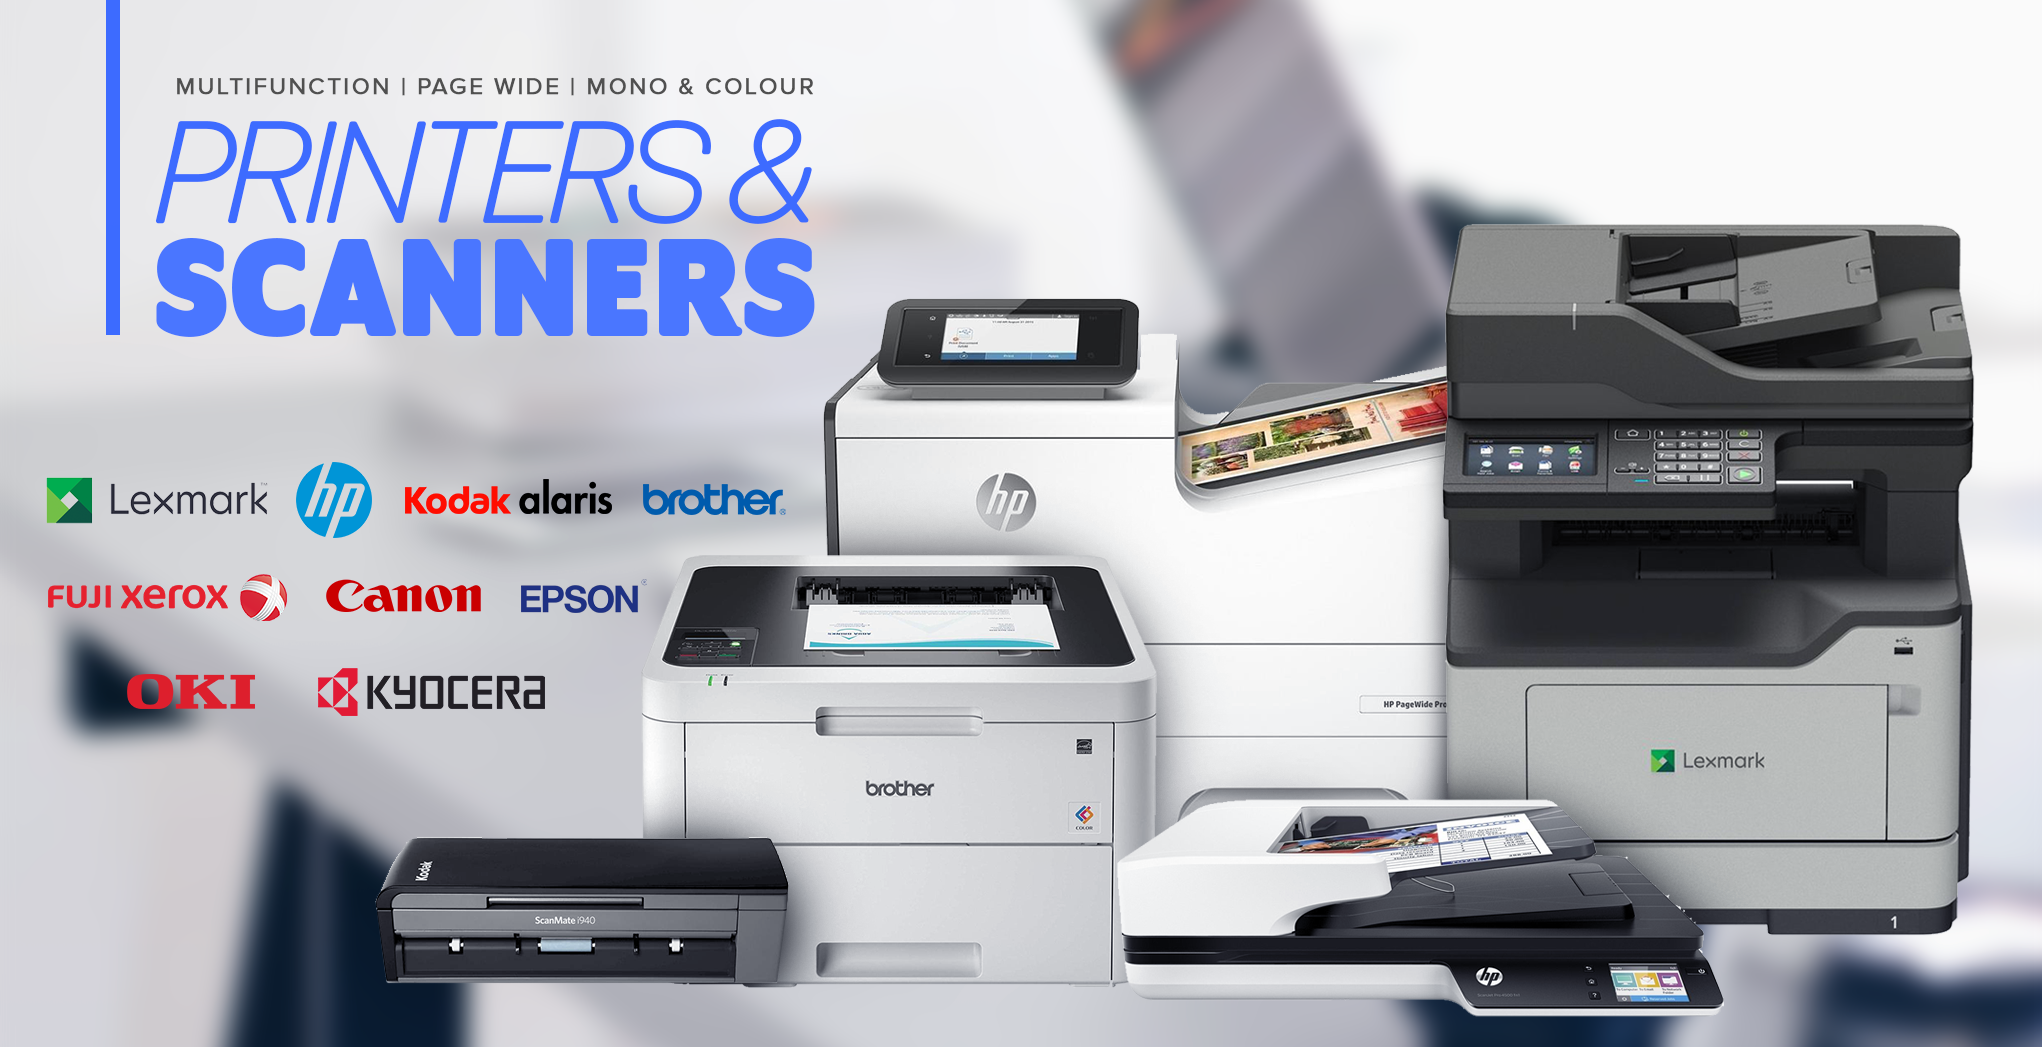 printers-scanners-mediaform.png